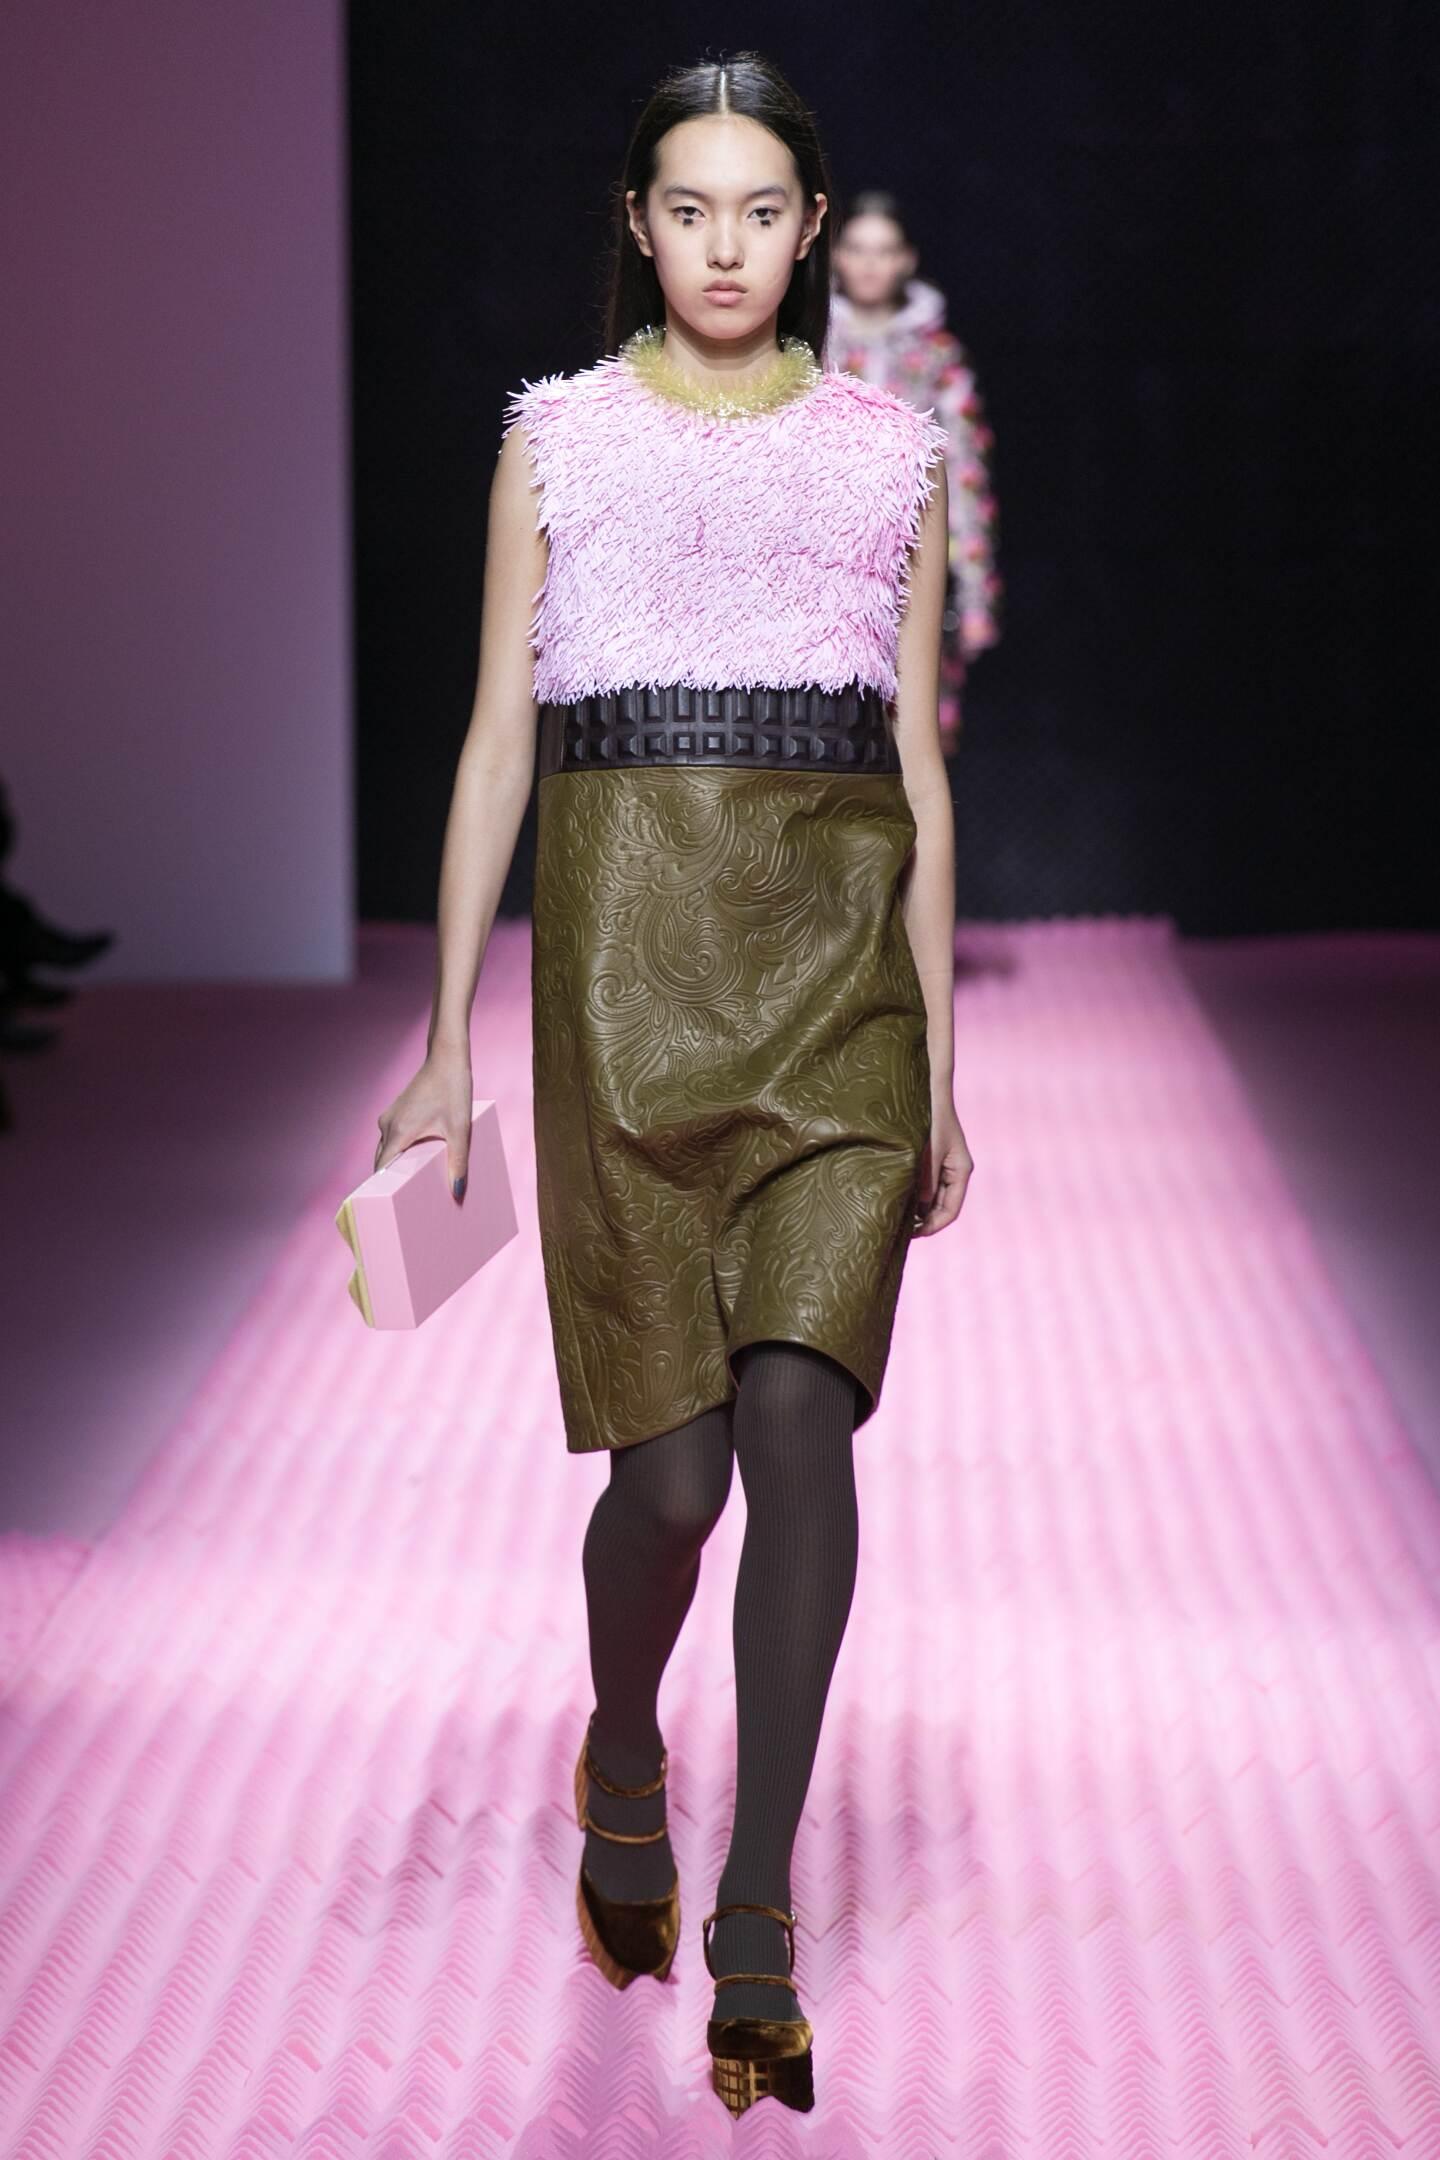 Catwalk Mary Katrantzou Collection Fashion Show Winter 2015